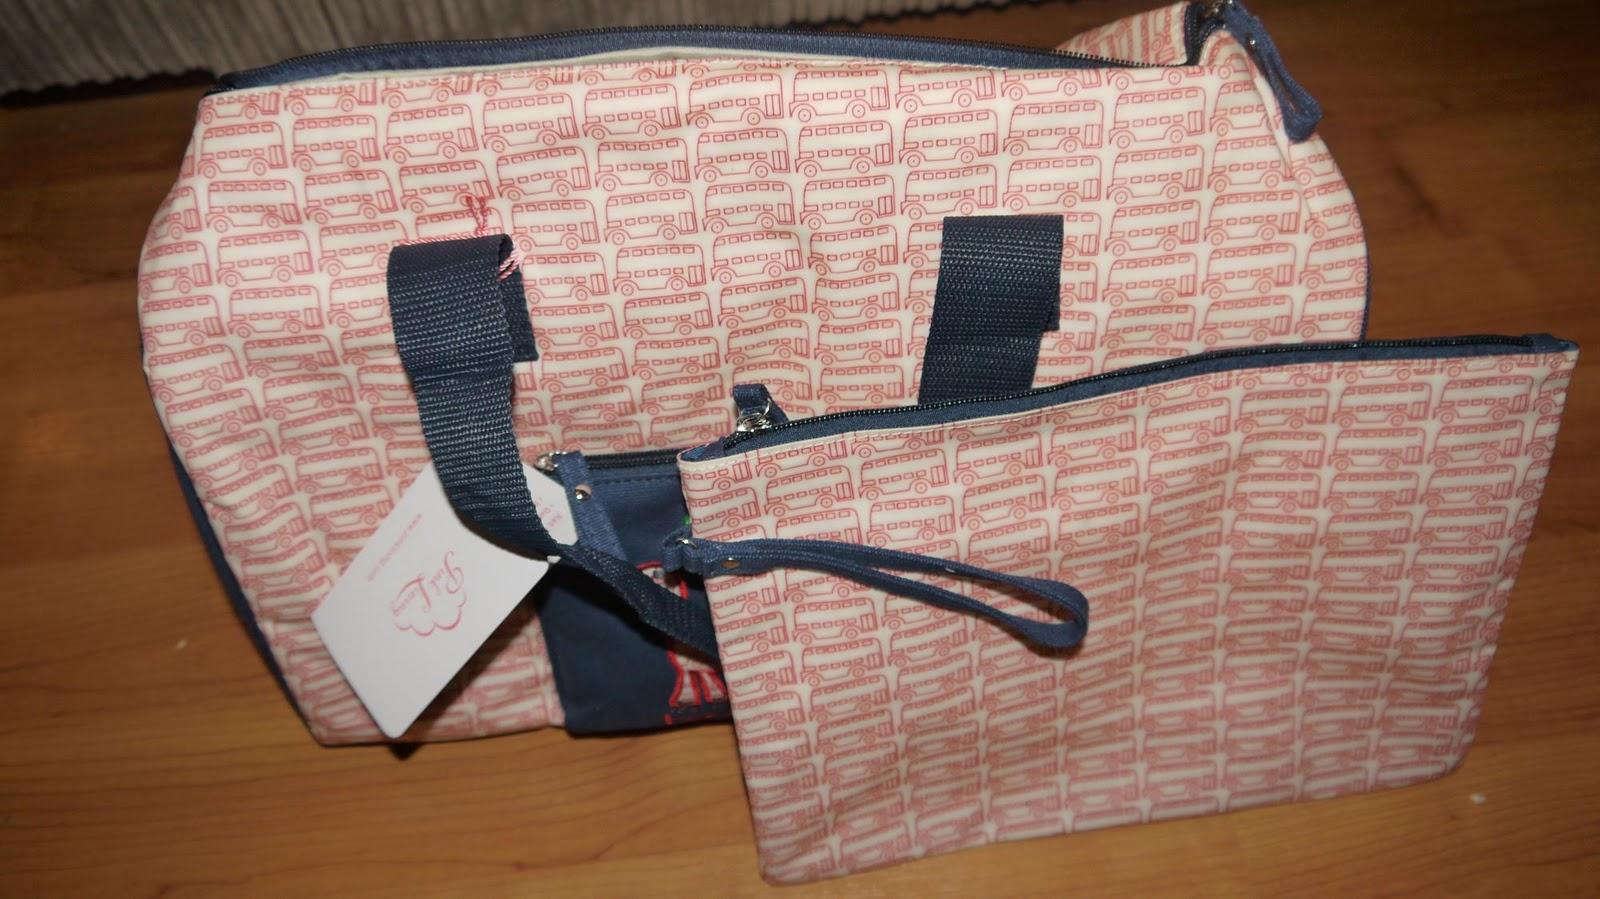 http://2.bp.blogspot.com/-YFqU9ZhuHdE/TqcoNGYQfnI/AAAAAAAACig/aGzjM5iz2OM/s1600/pink-ling-overnight-bag.JPG